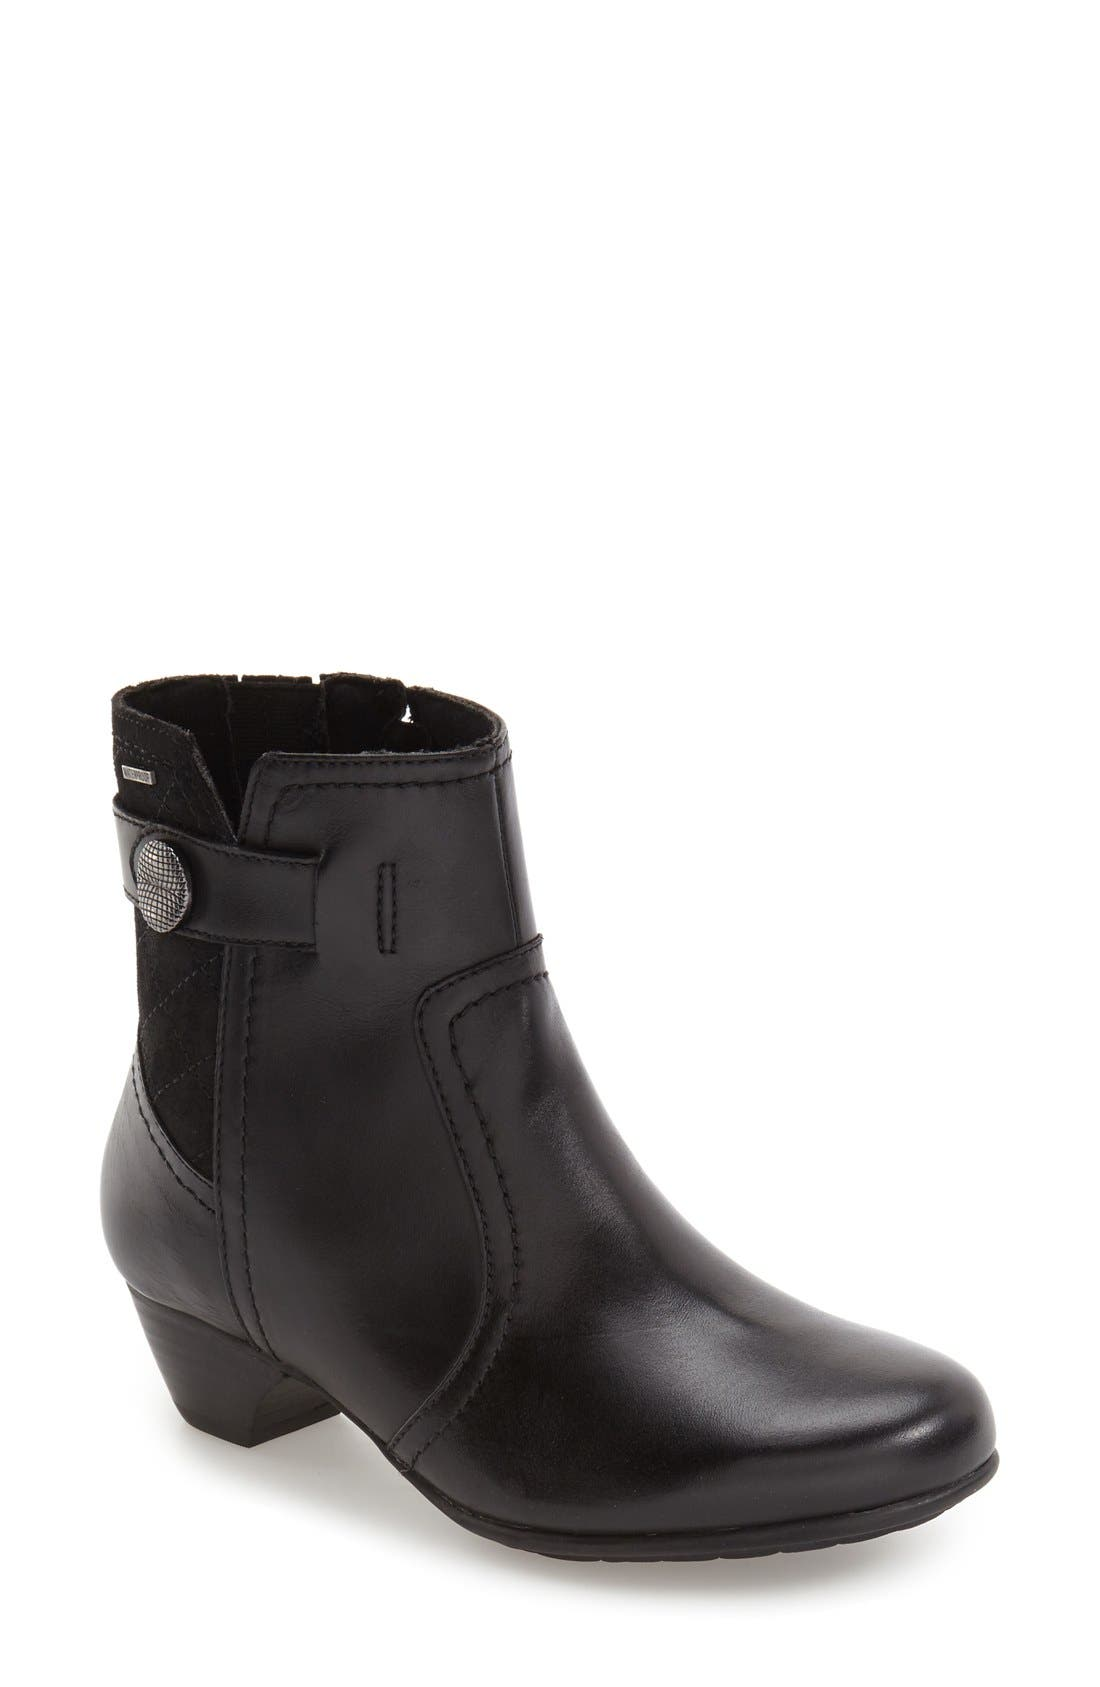 'Patrina' Waterproof Zip Bootie,                         Main,                         color, BLACK MULTI LEATHER